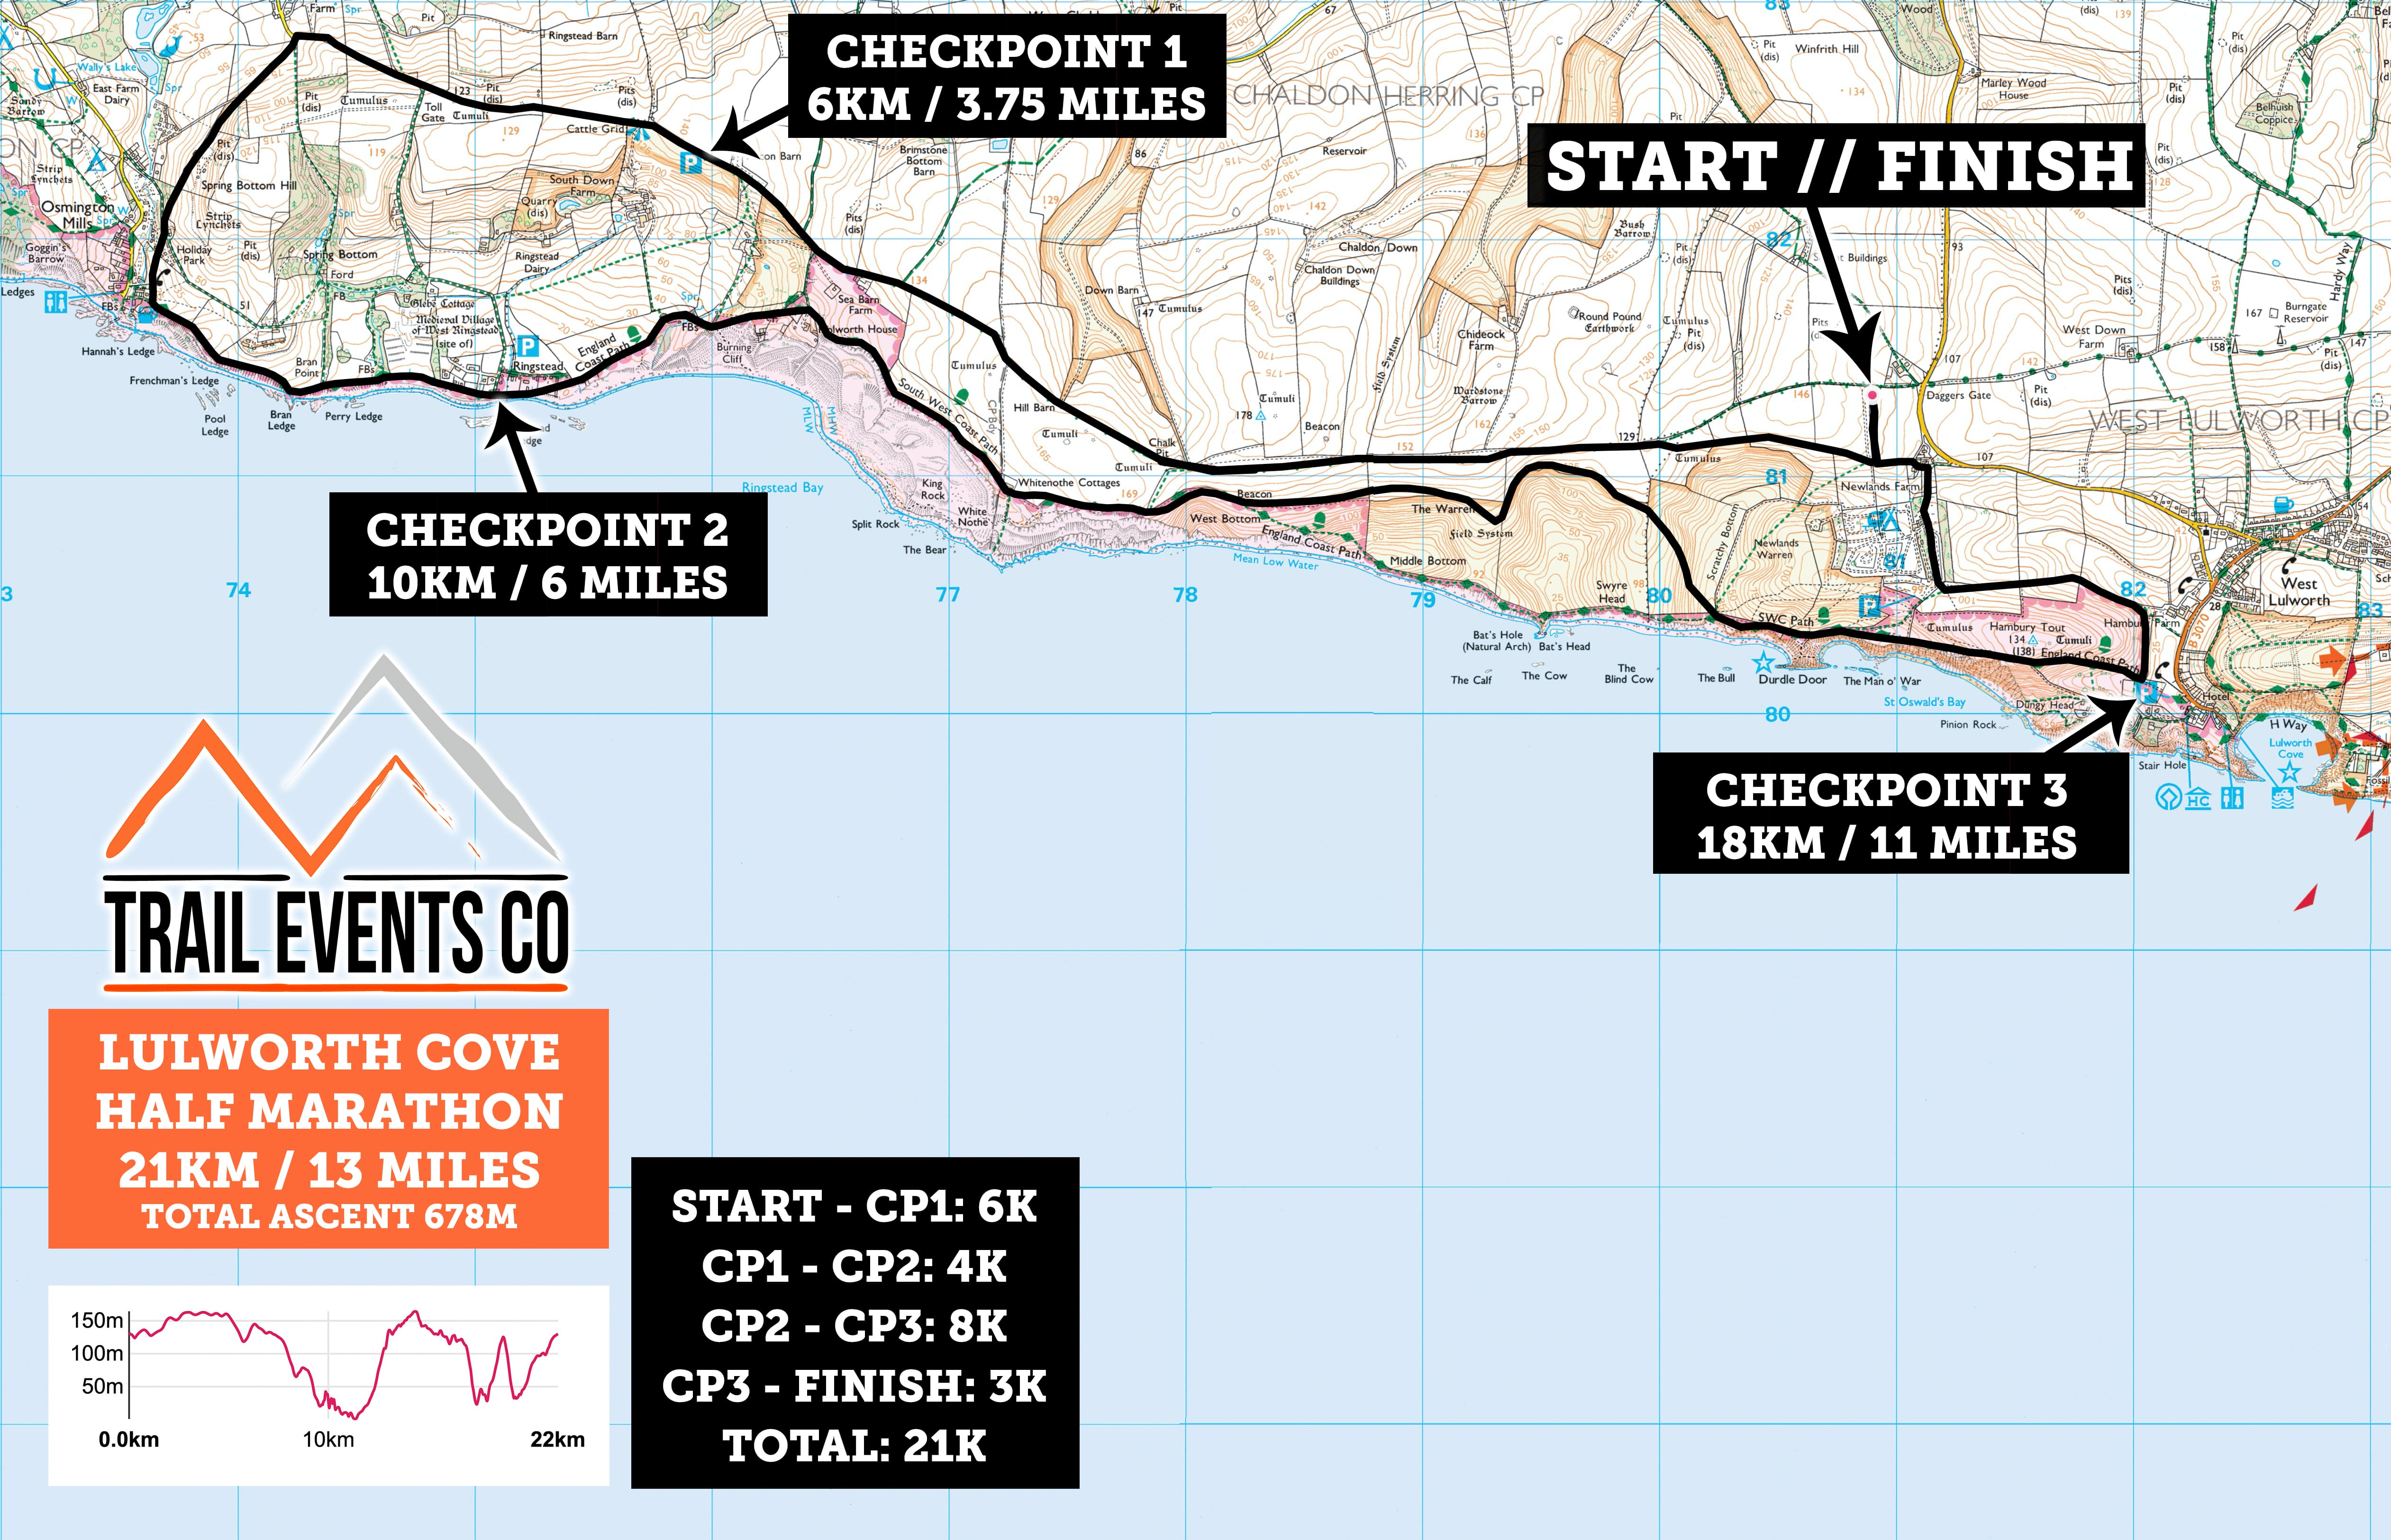 Lulworth Cove - Half Marathon